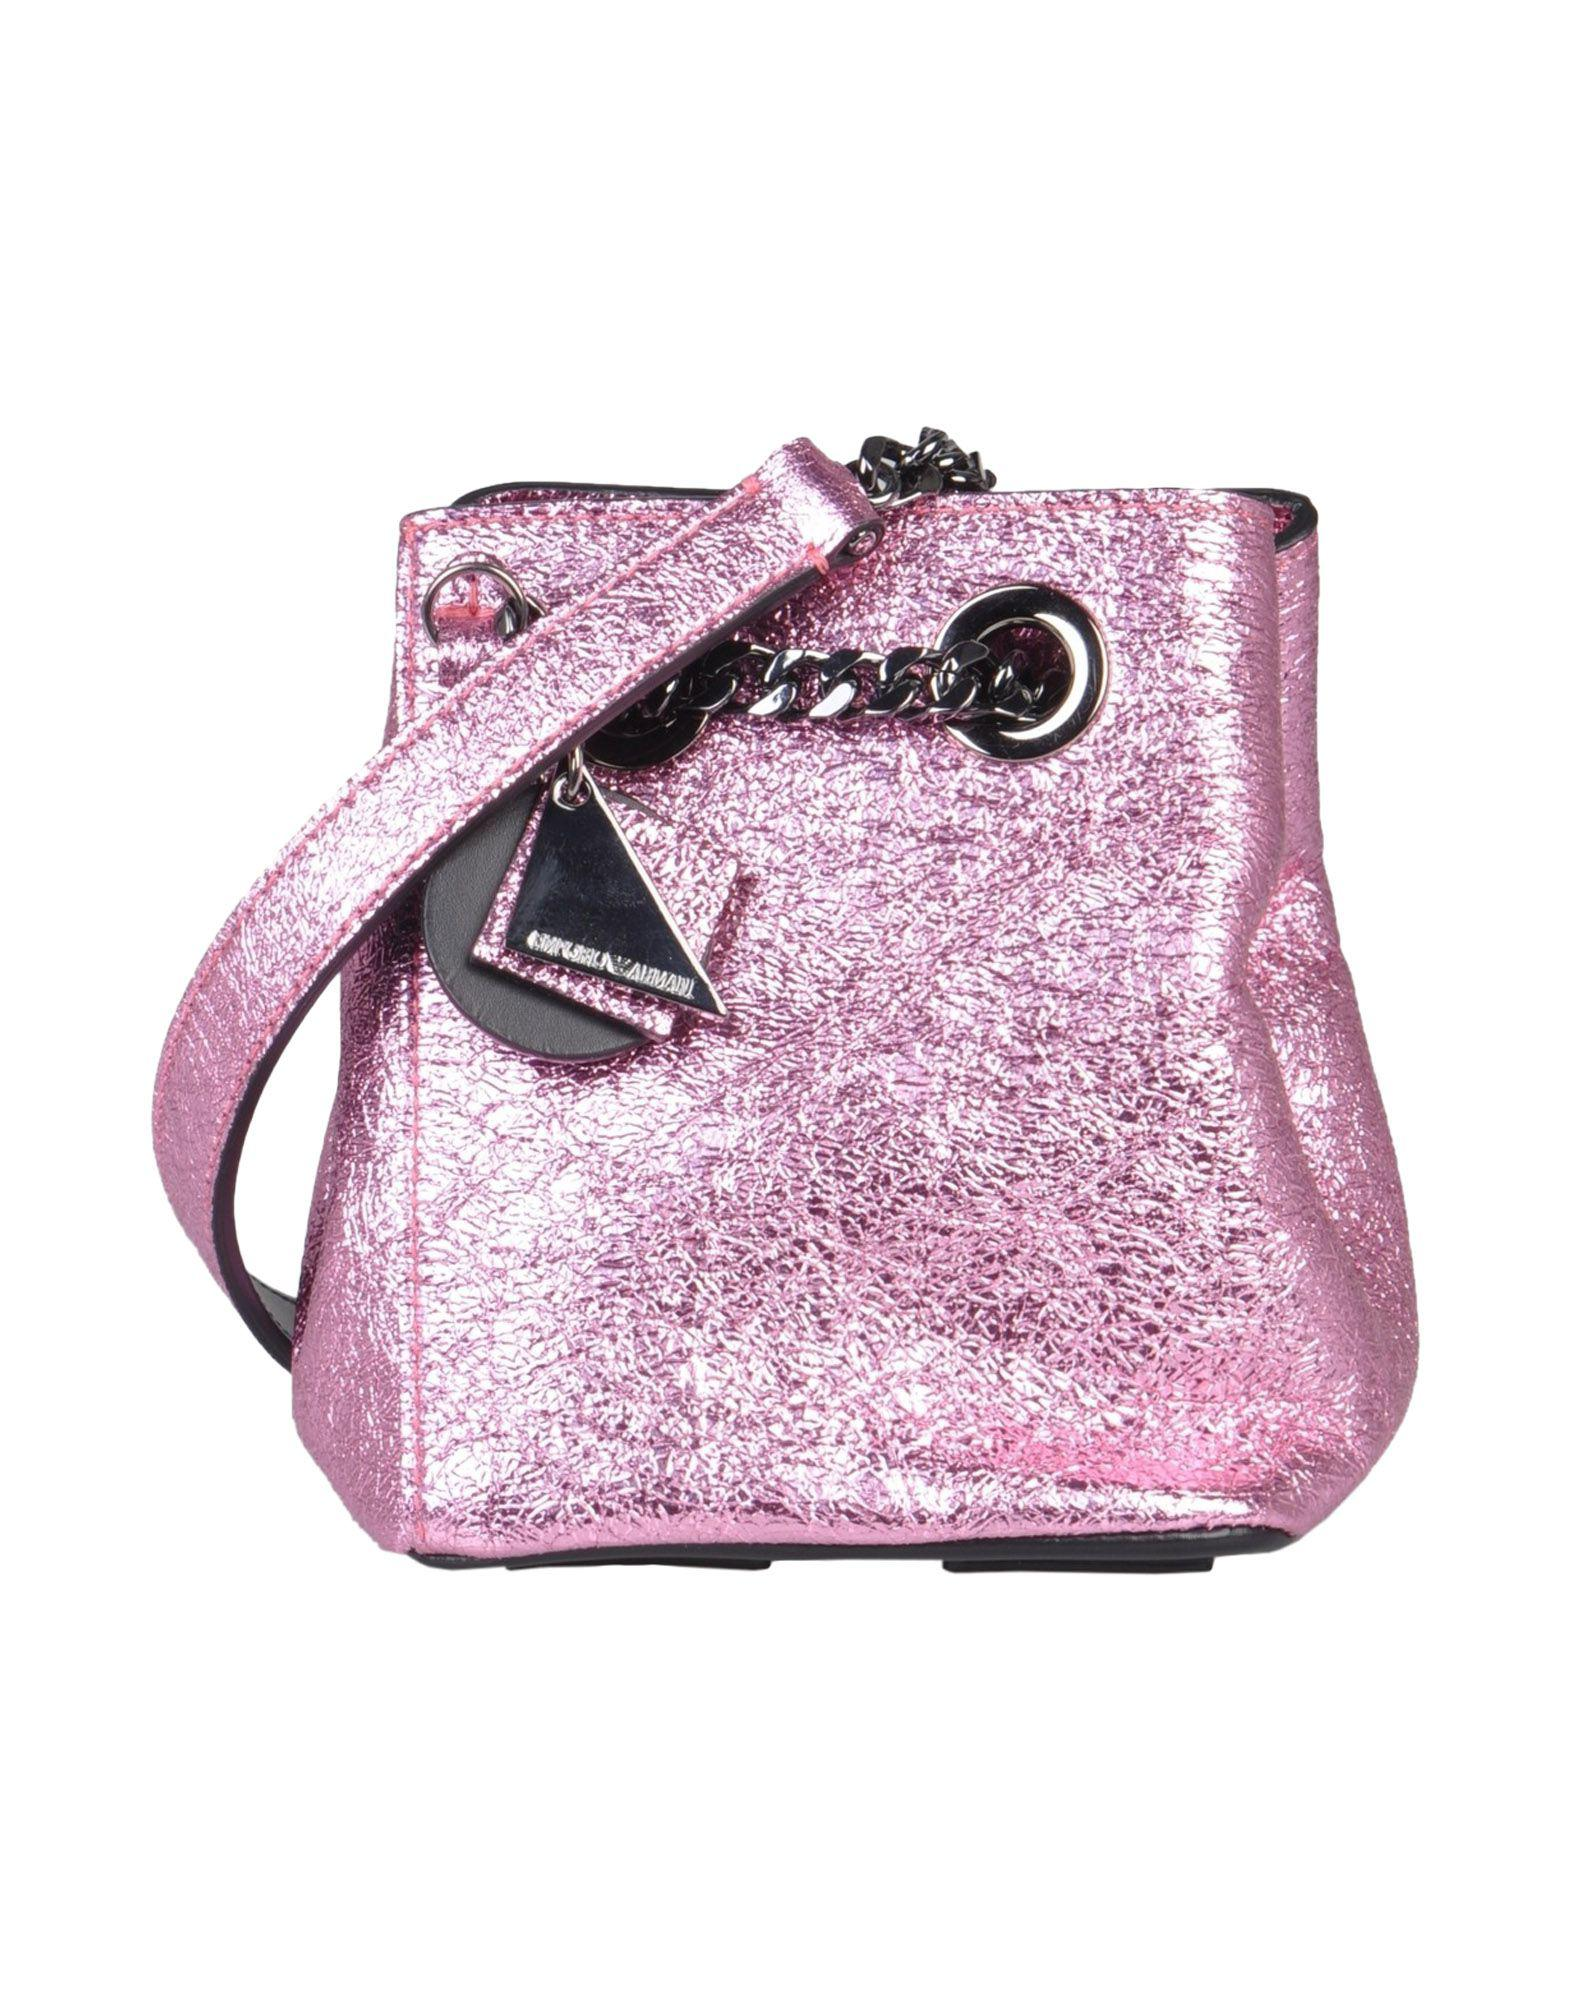 Emporio Armani Cross-body Bag in Pink - Lyst 6ce86df32fcc7